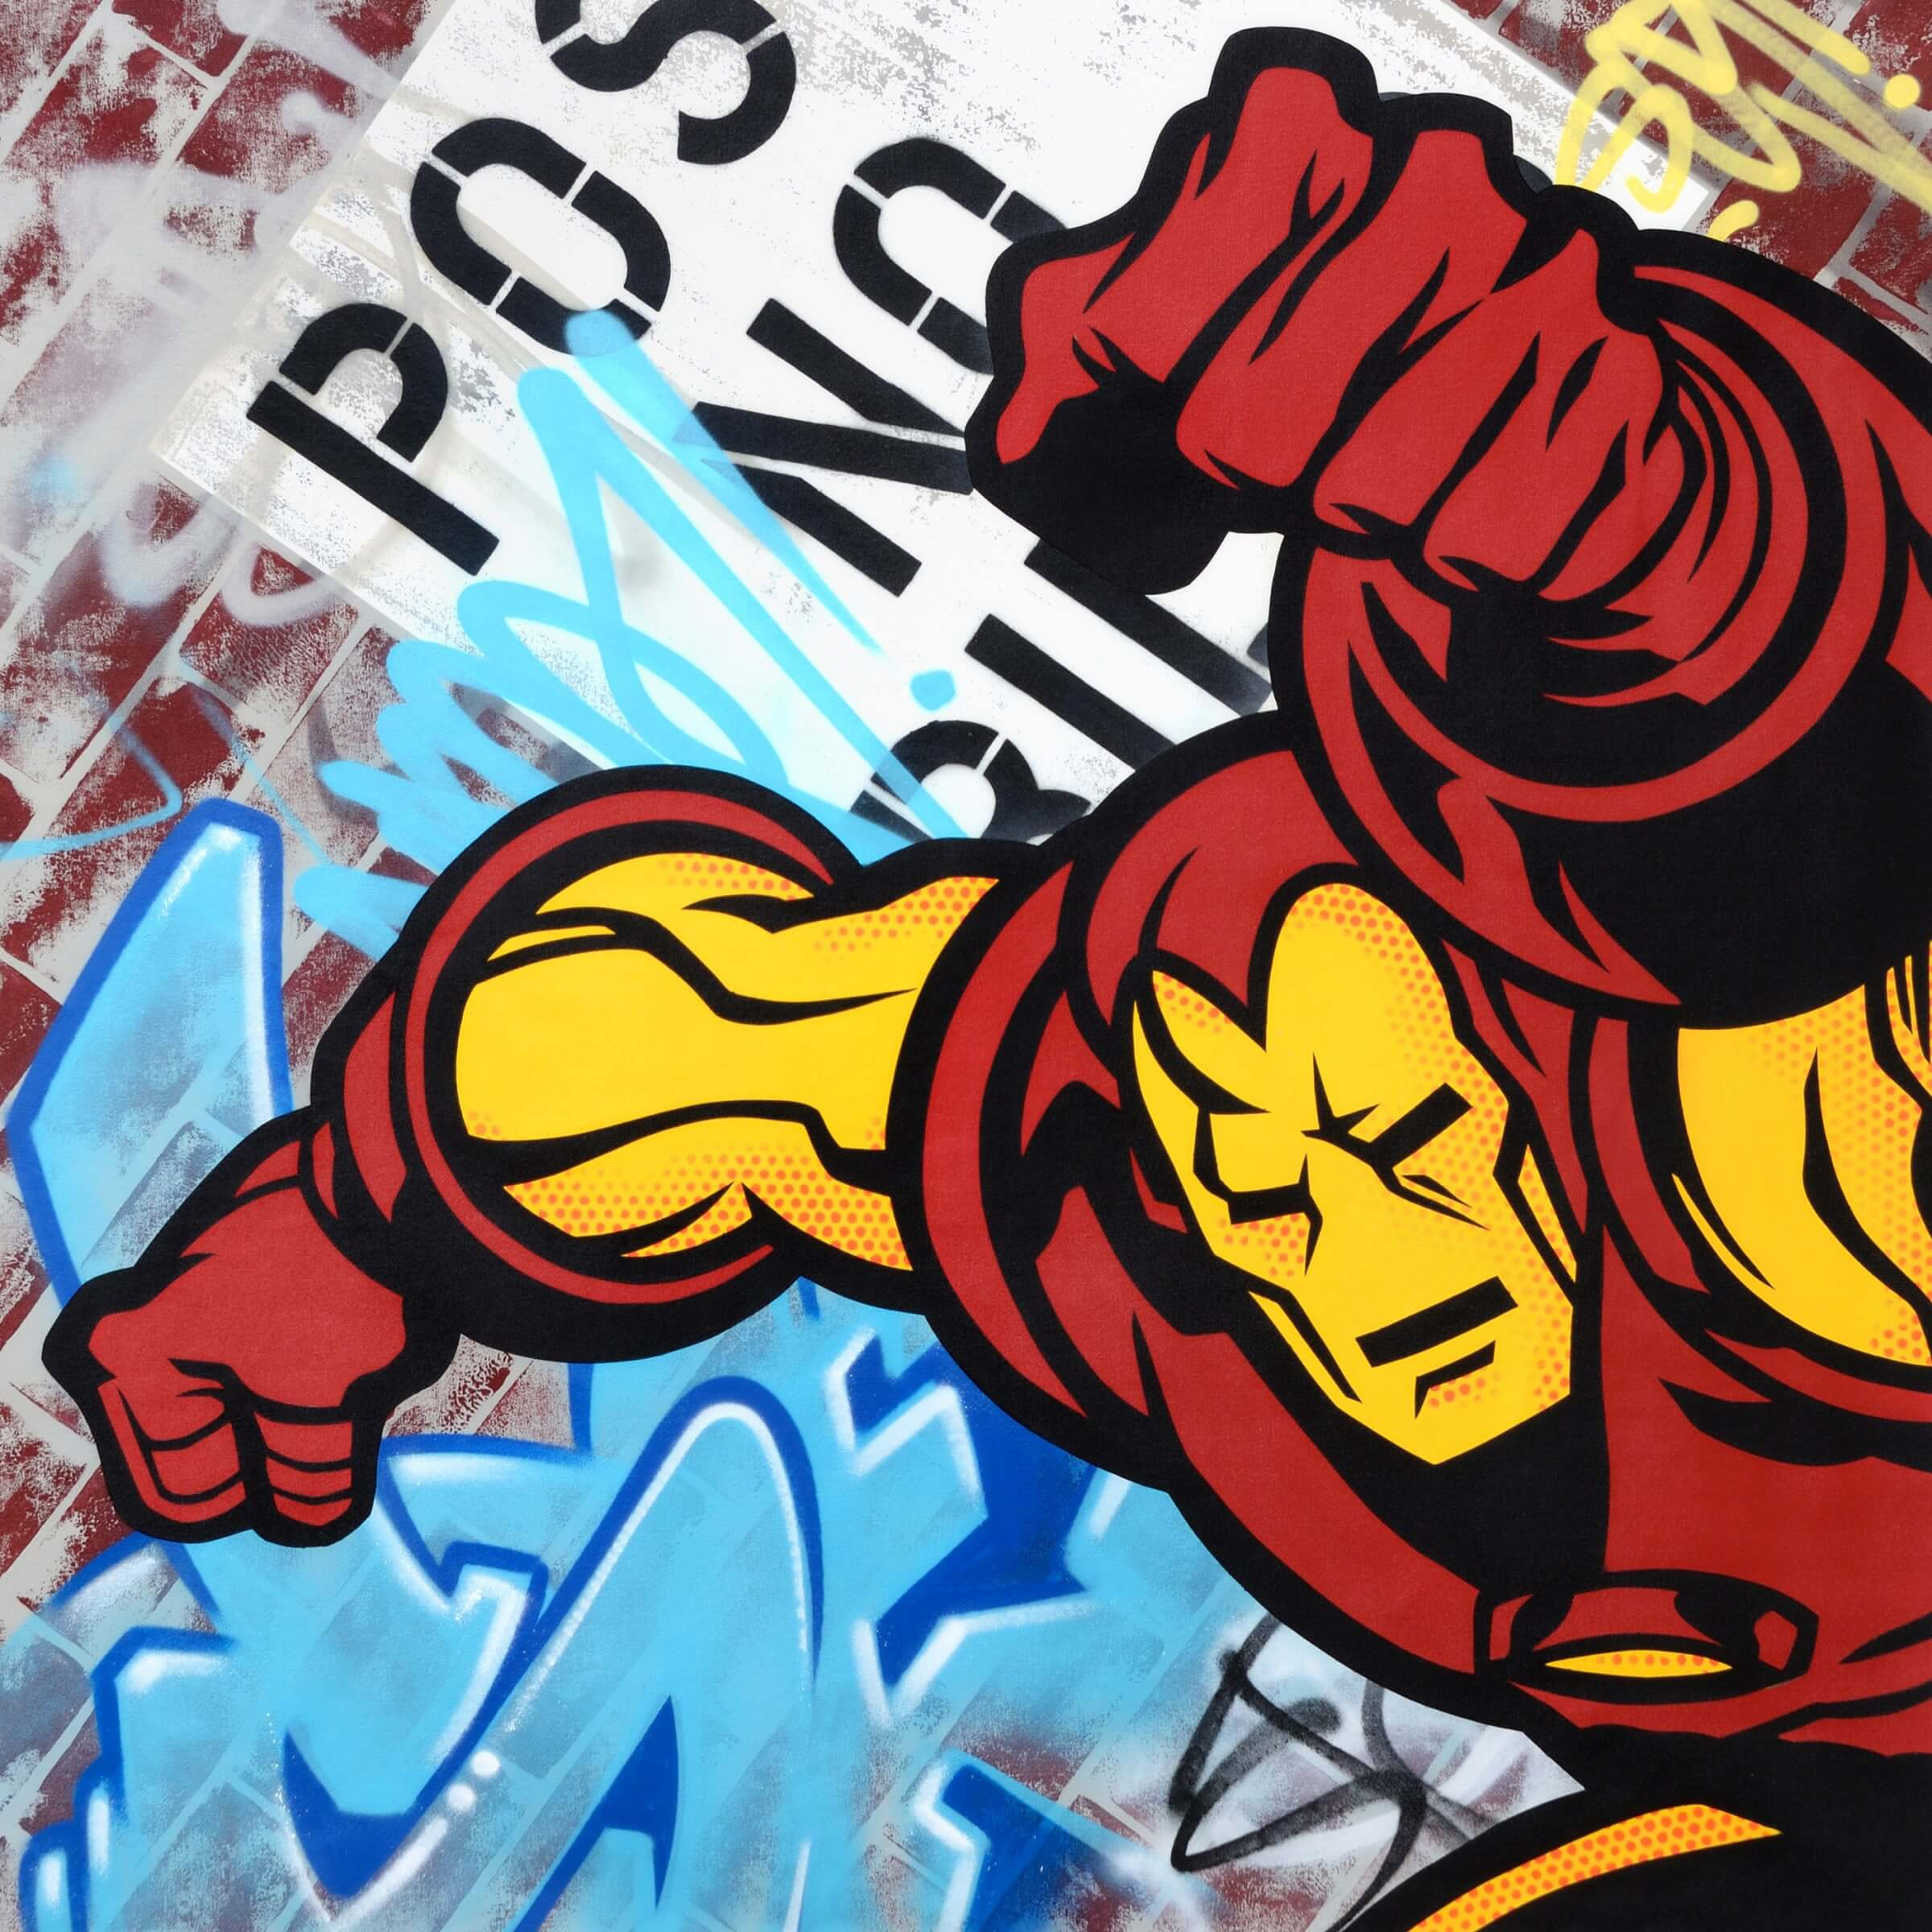 Iron man 2016